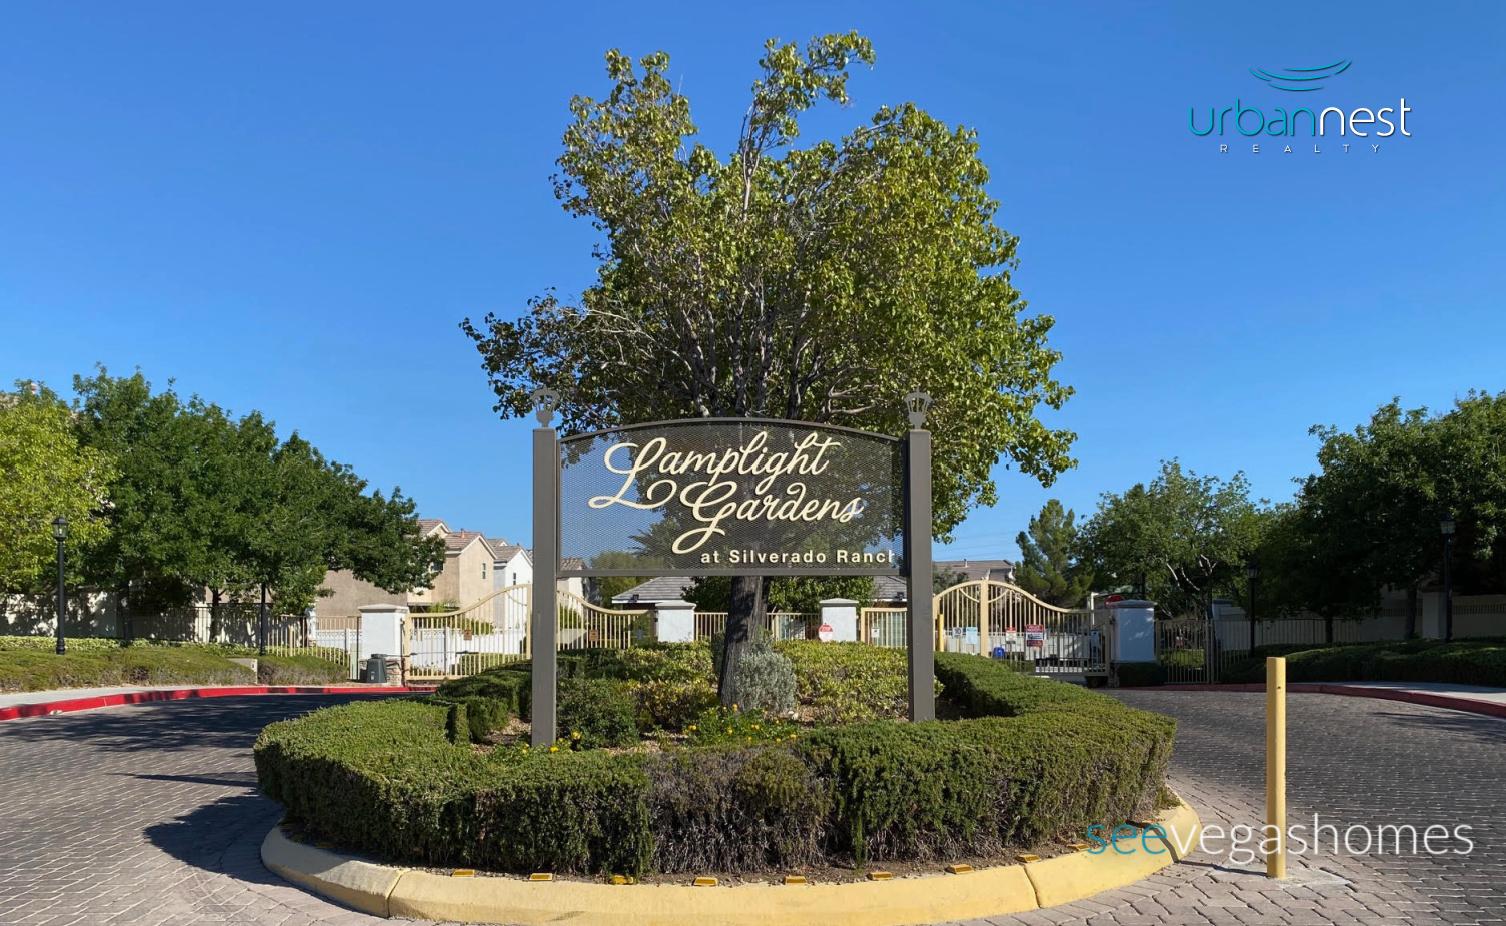 Lamplight_Gardens_at_Silverado_Ranch_Las_Vegas_NV_89183_SeeVegasHomes